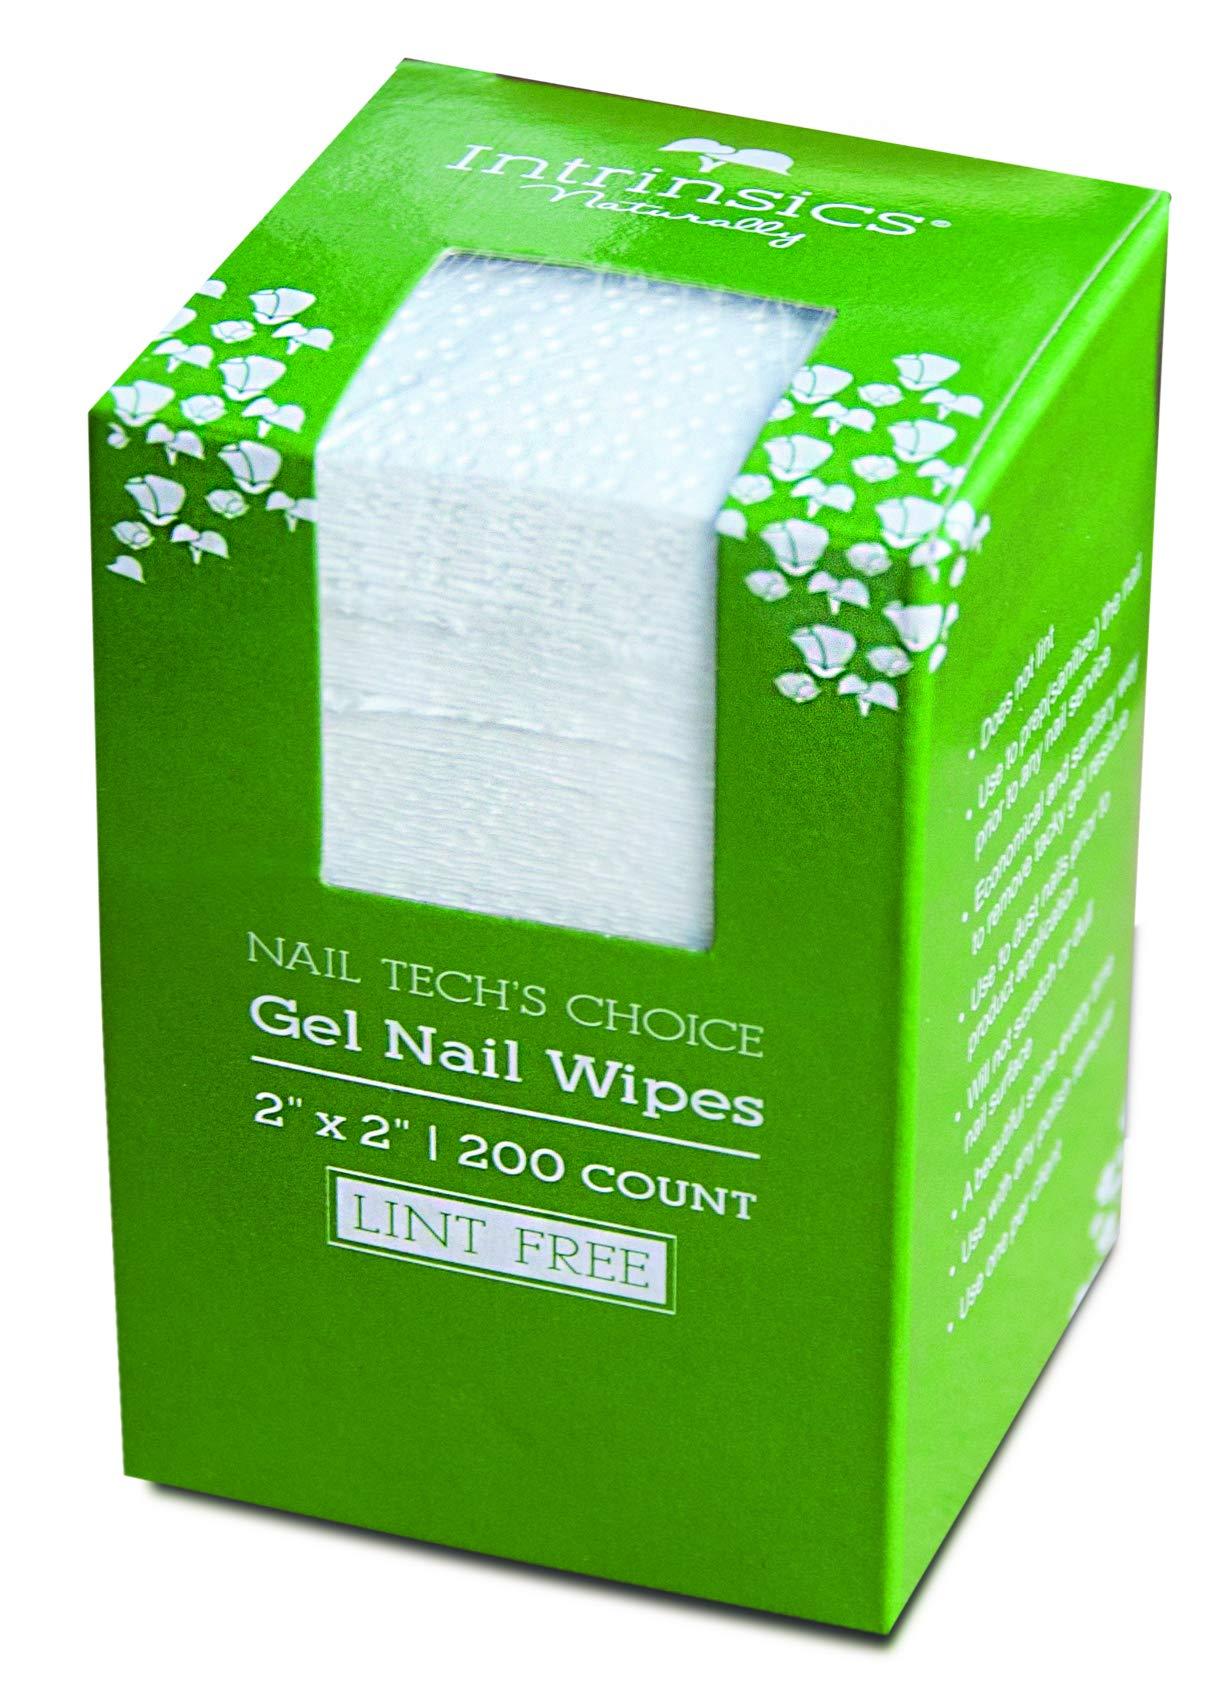 Intrinsics Nail Tech's Choice Lint Free Gel Nail Wipes - 2 x 2, 200 Count